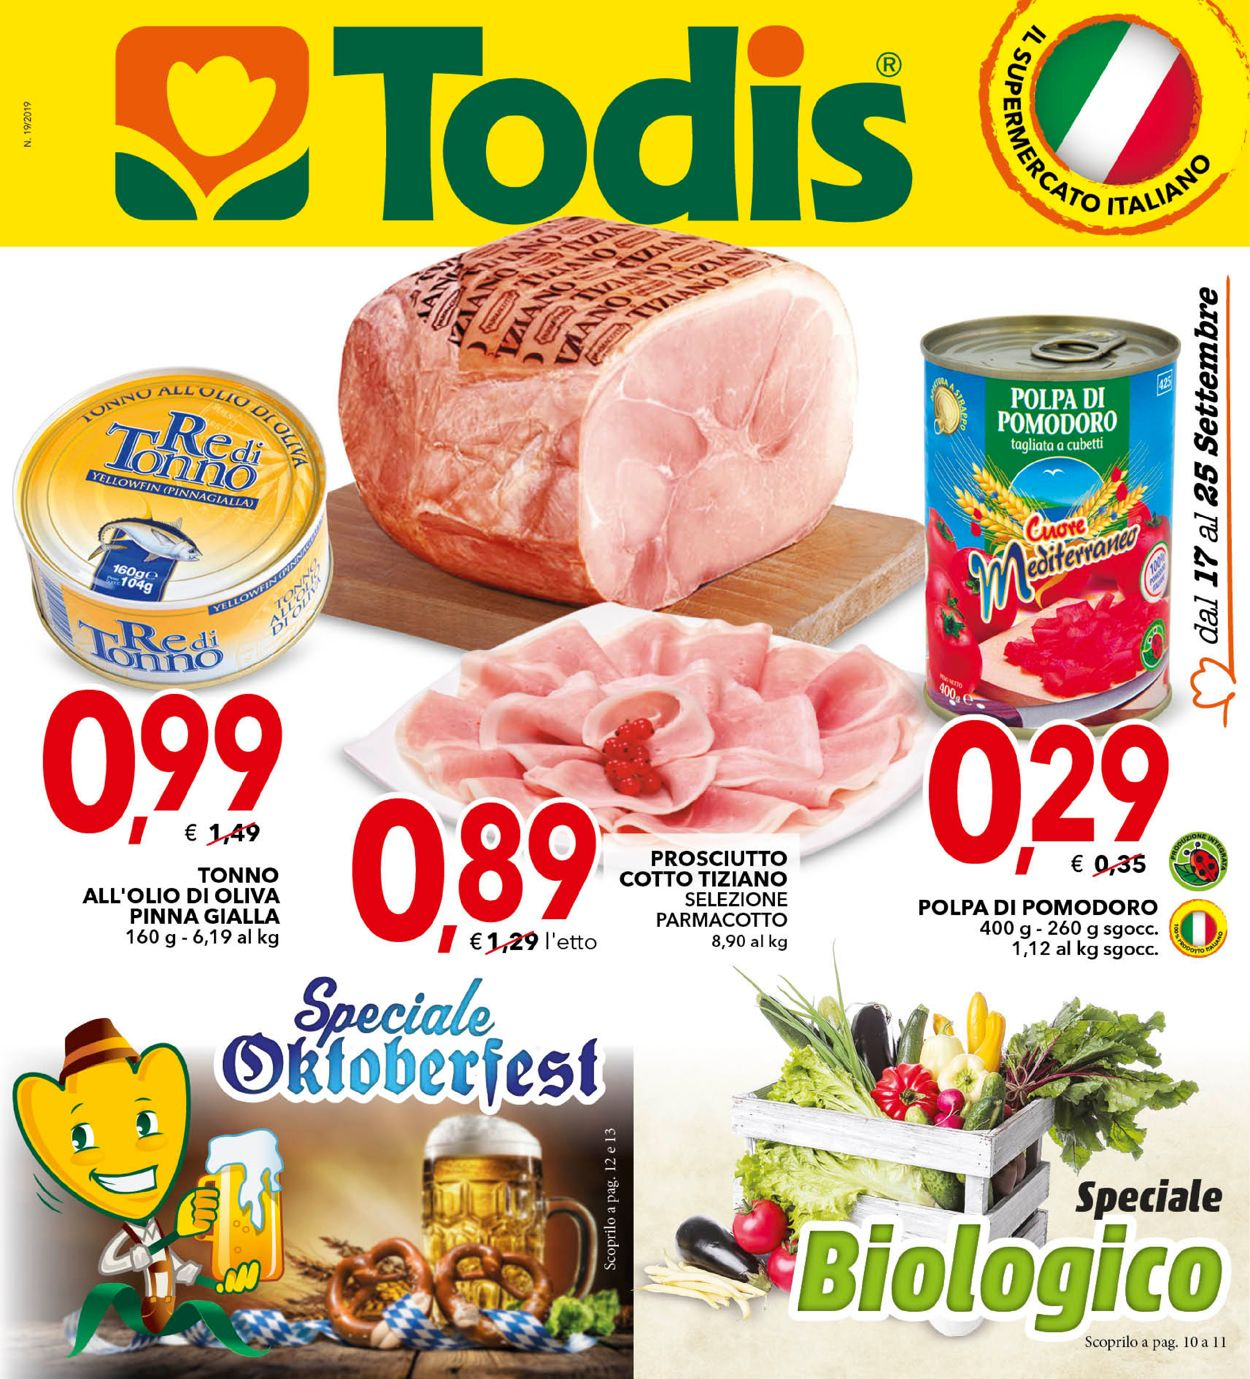 Volantino Todis - Offerte 17/09-25/09/2019